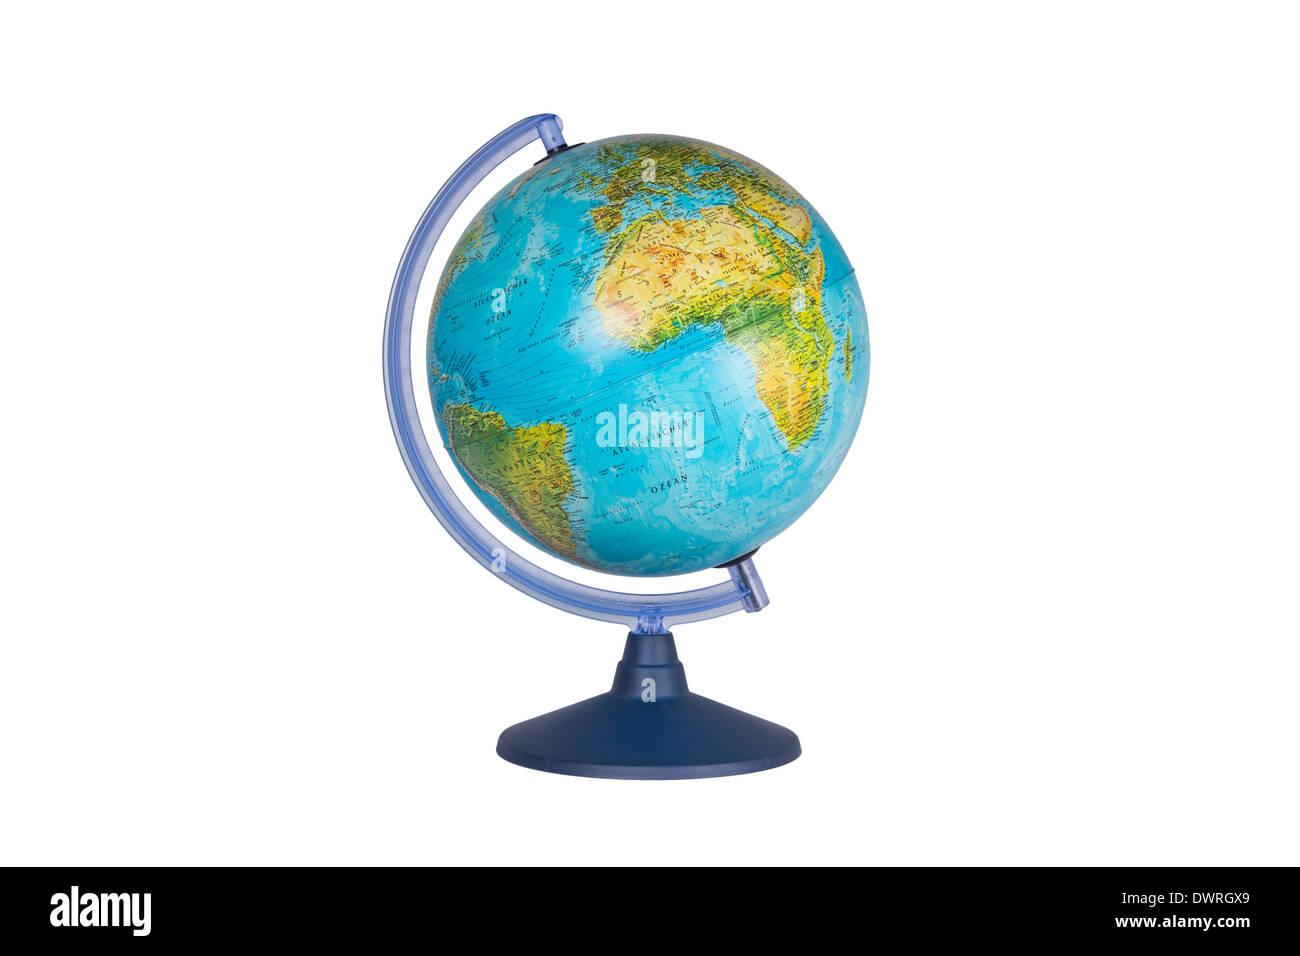 Globe on white background with path - Stock Image